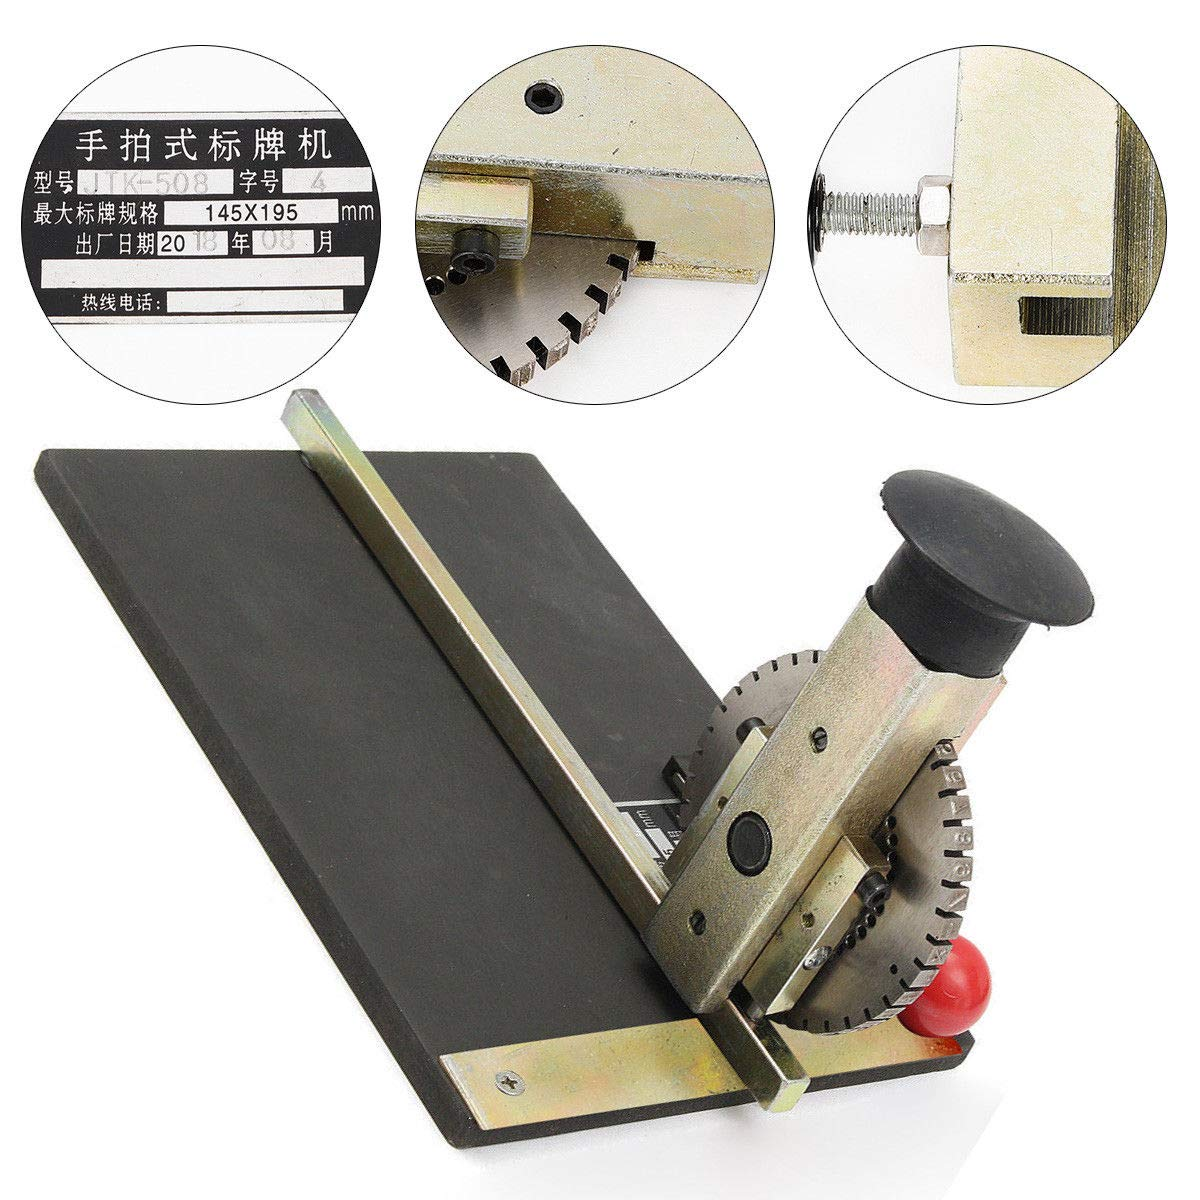 Stamping Embosser Manual Embossing Machine Metal Deboss Plate Dog Tag Printer